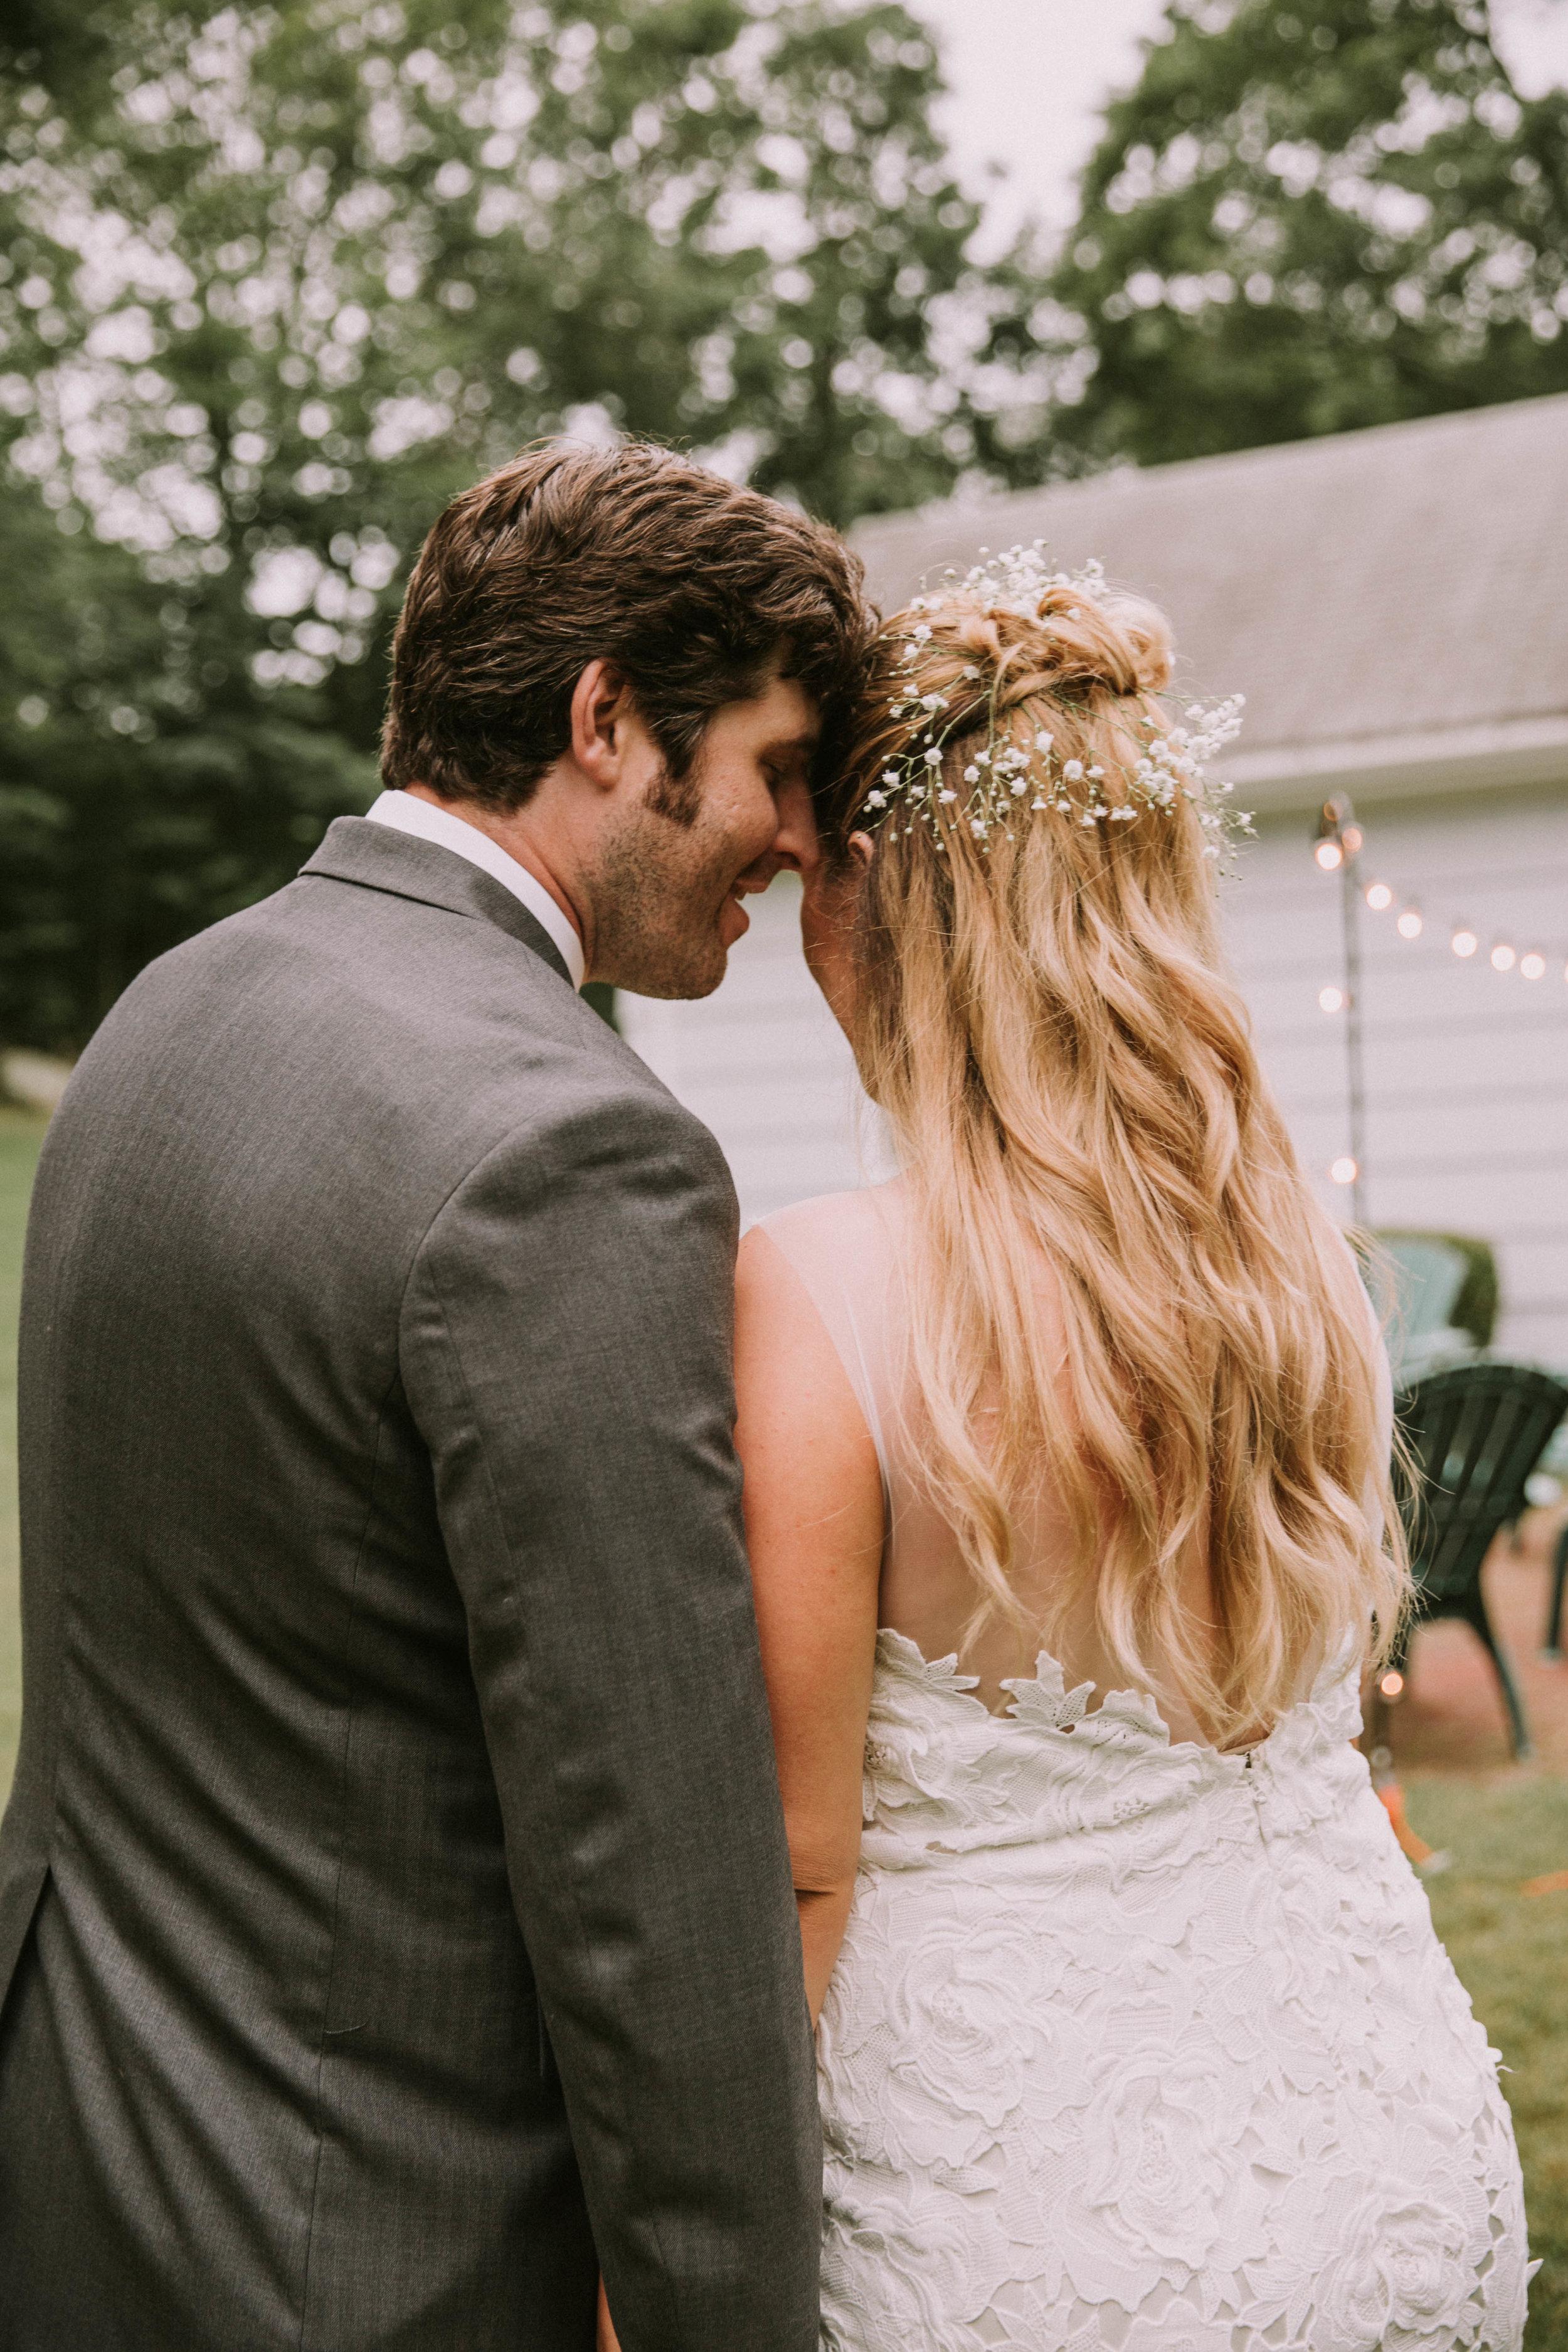 spitale-elopement-blog-11-of-18.jpg